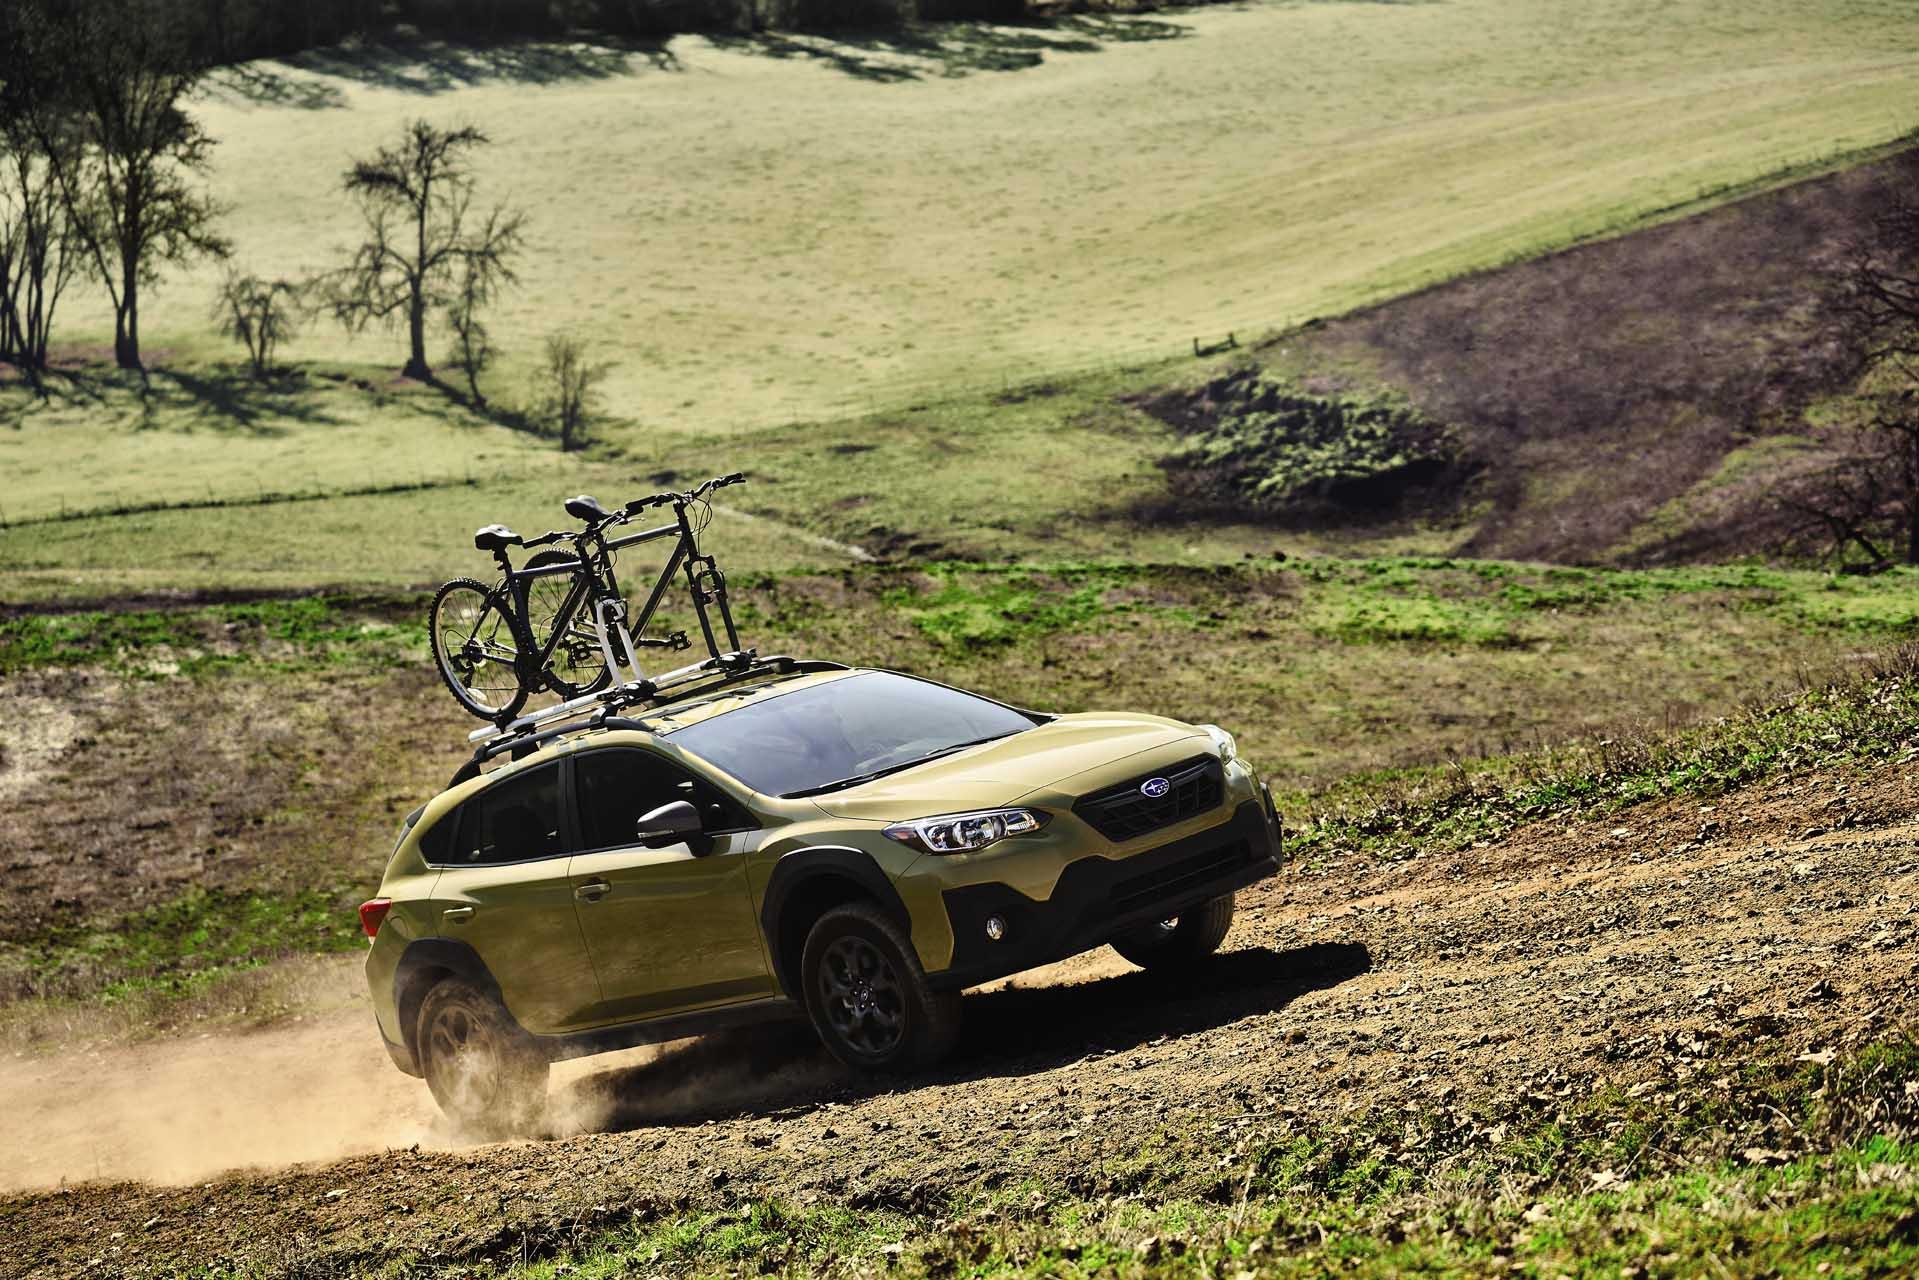 2021 Subaru Crosstrek revealed: Small crossover SUV adds ...